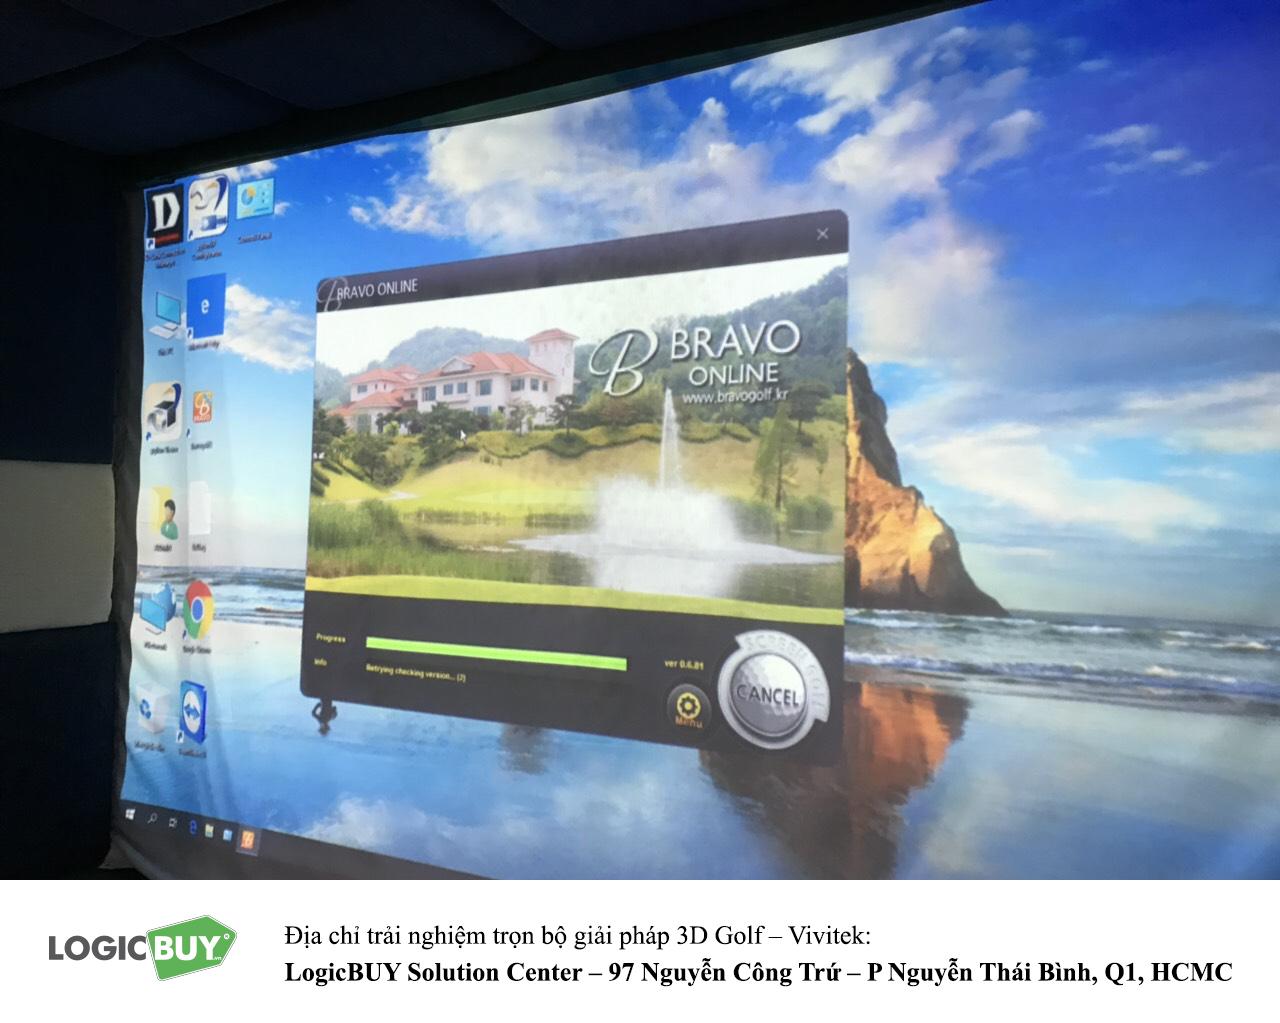 Phòng Golf 3D Vivitek 7